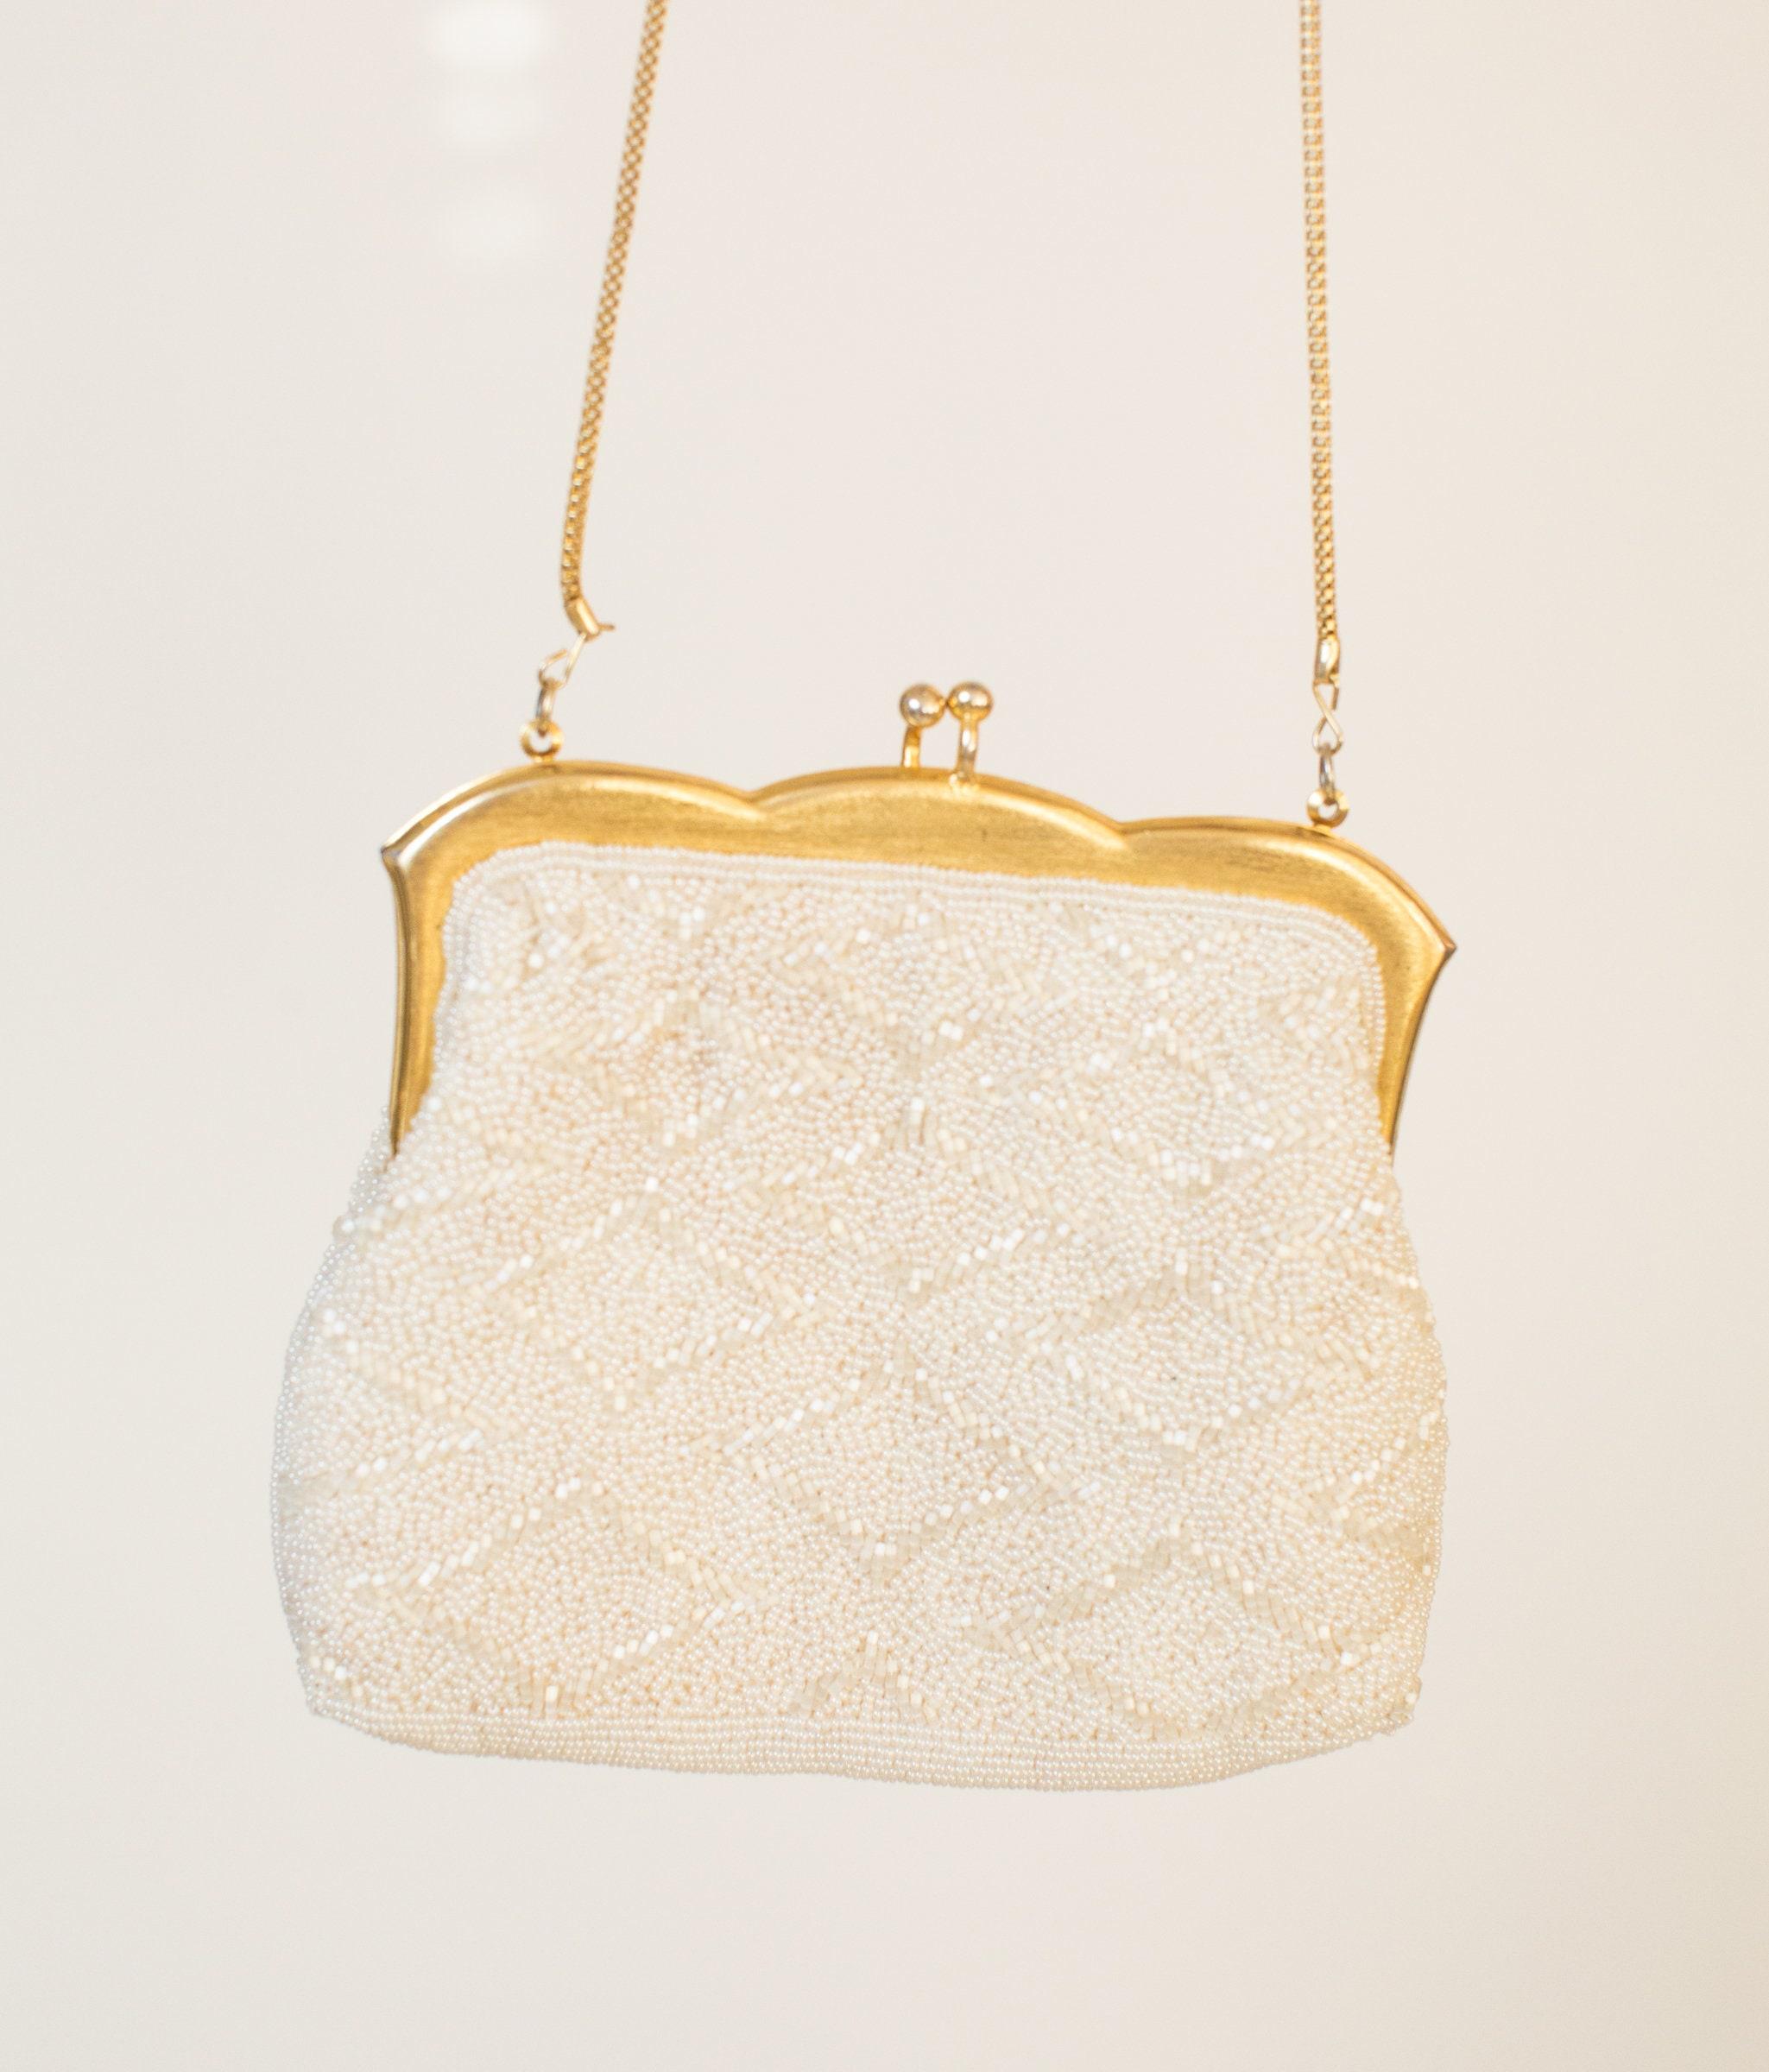 bbad02afe7 Beaded purse vintage handbag WEDDING purse BRIDAL purse gold   Etsy